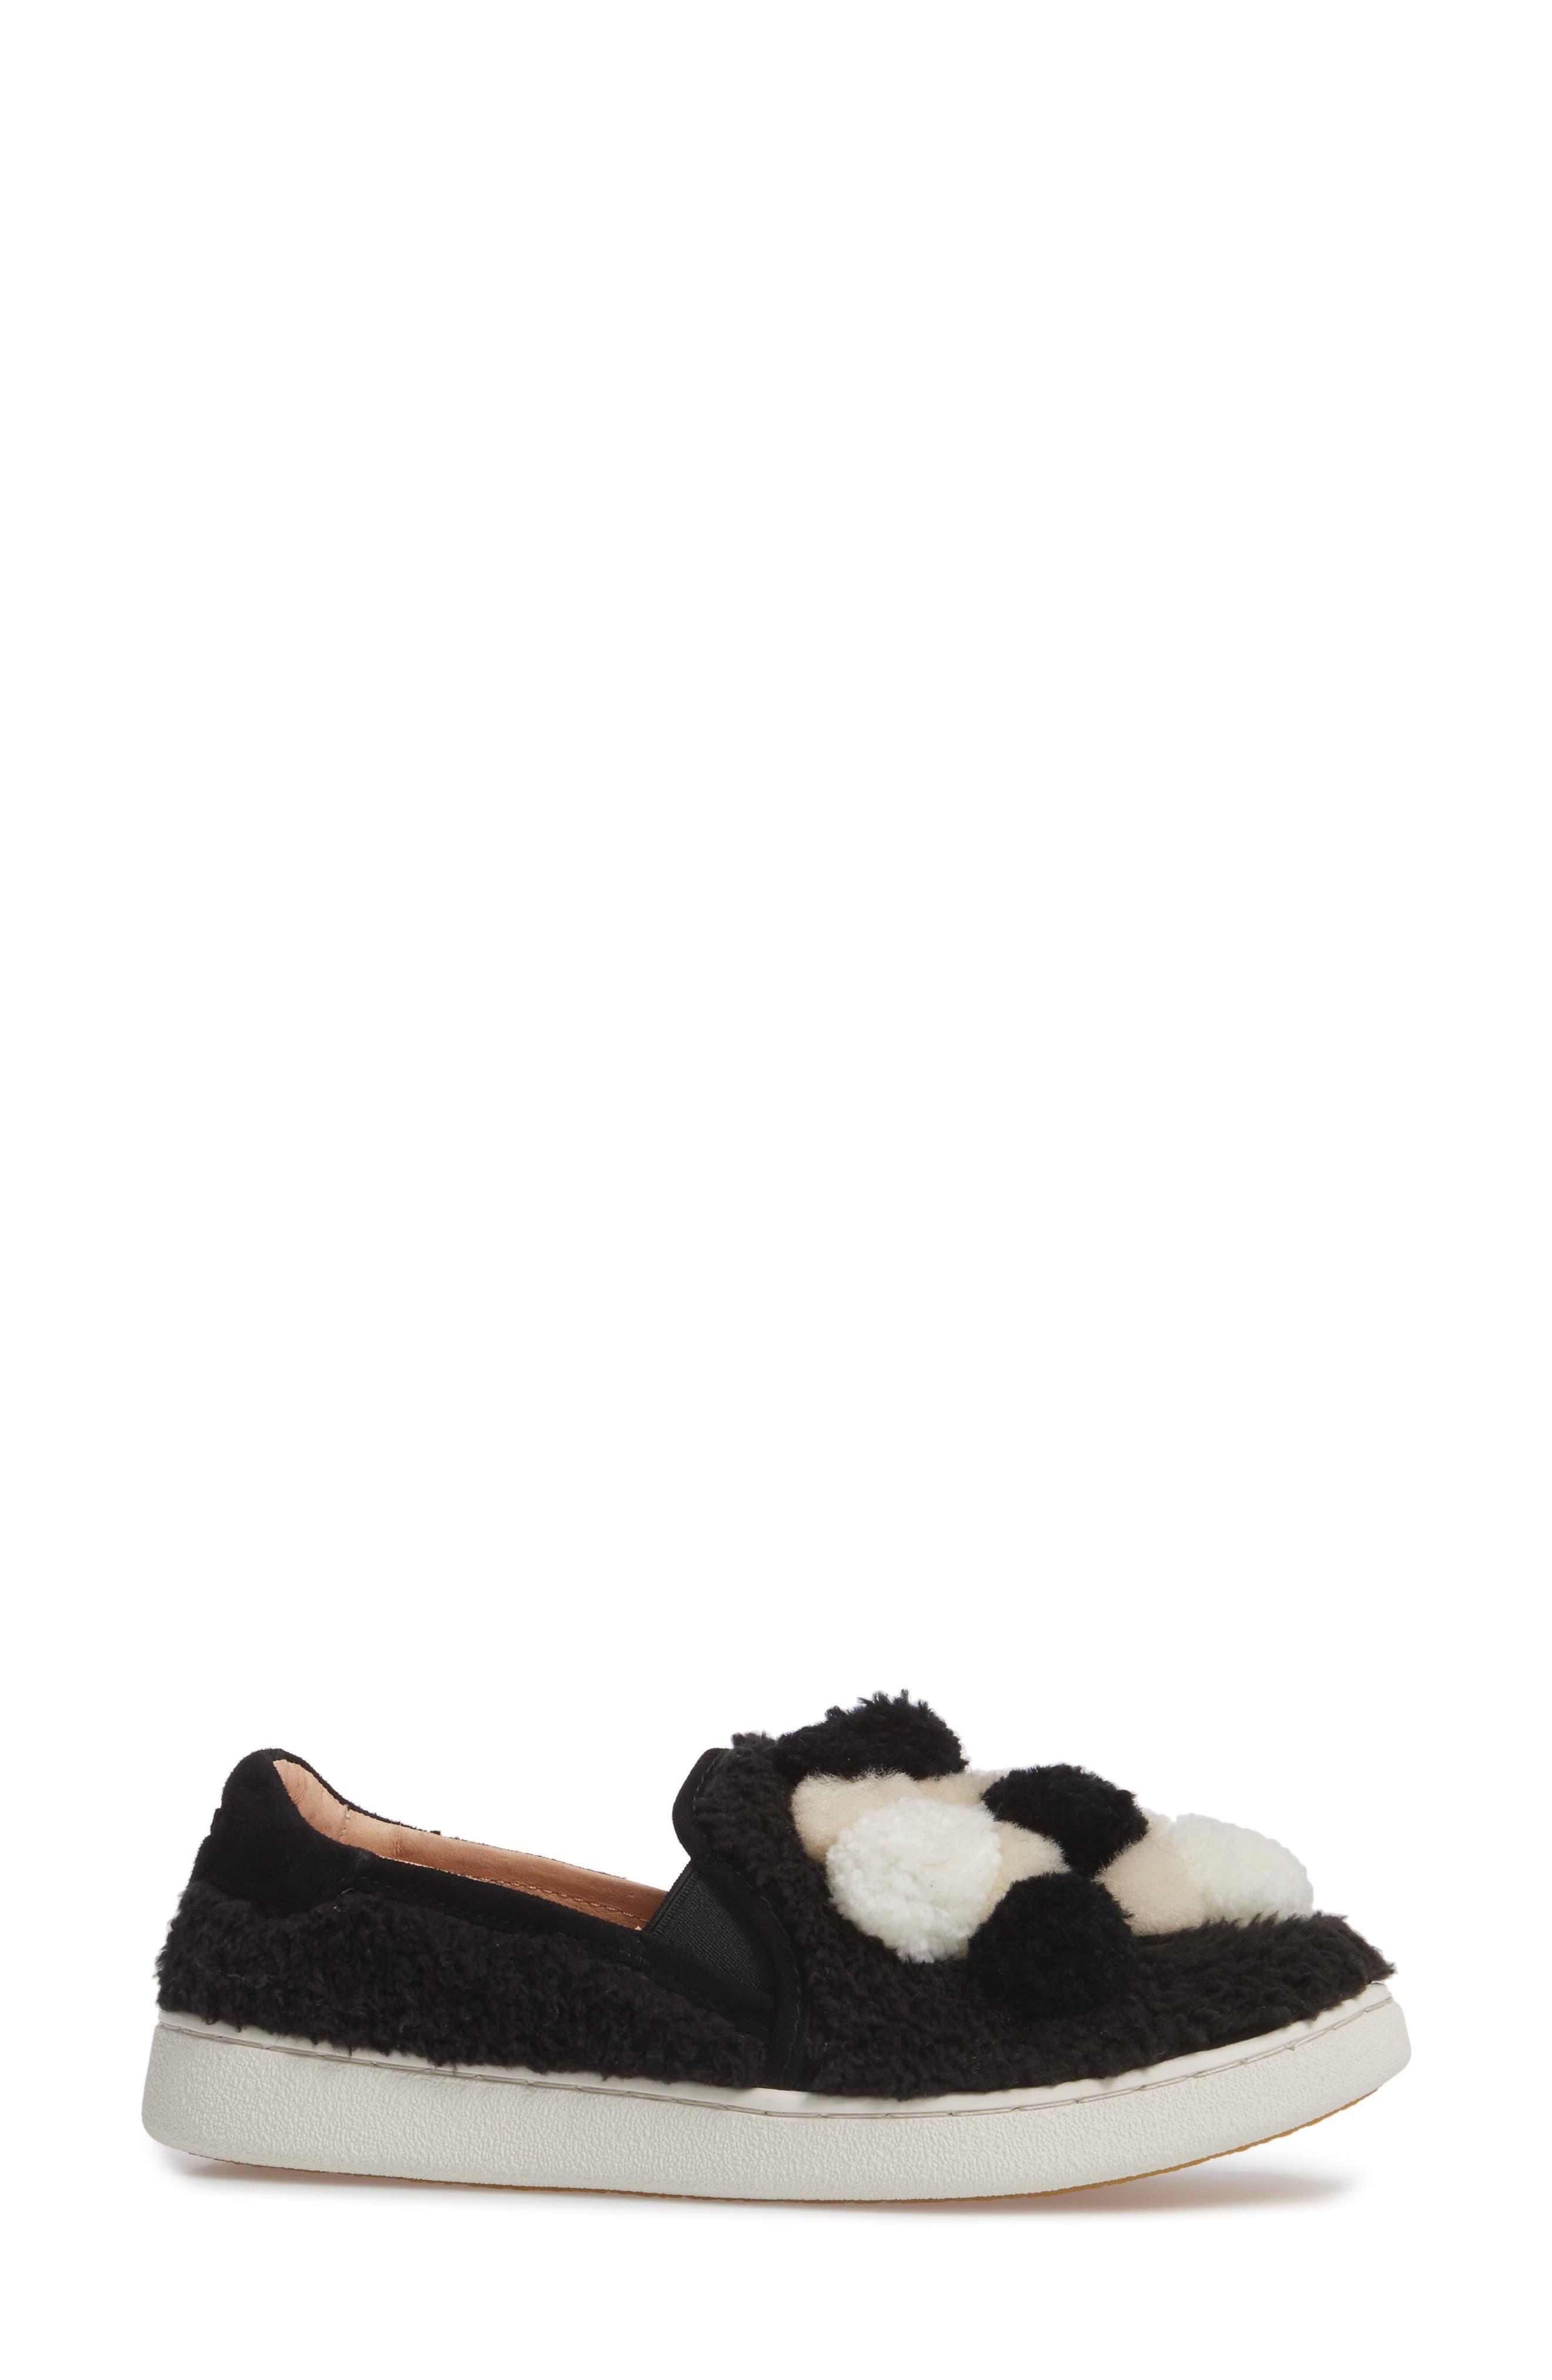 Ricci Plush Genuine Shearling Pompom Slip-On Sneaker,                             Alternate thumbnail 3, color,                             001